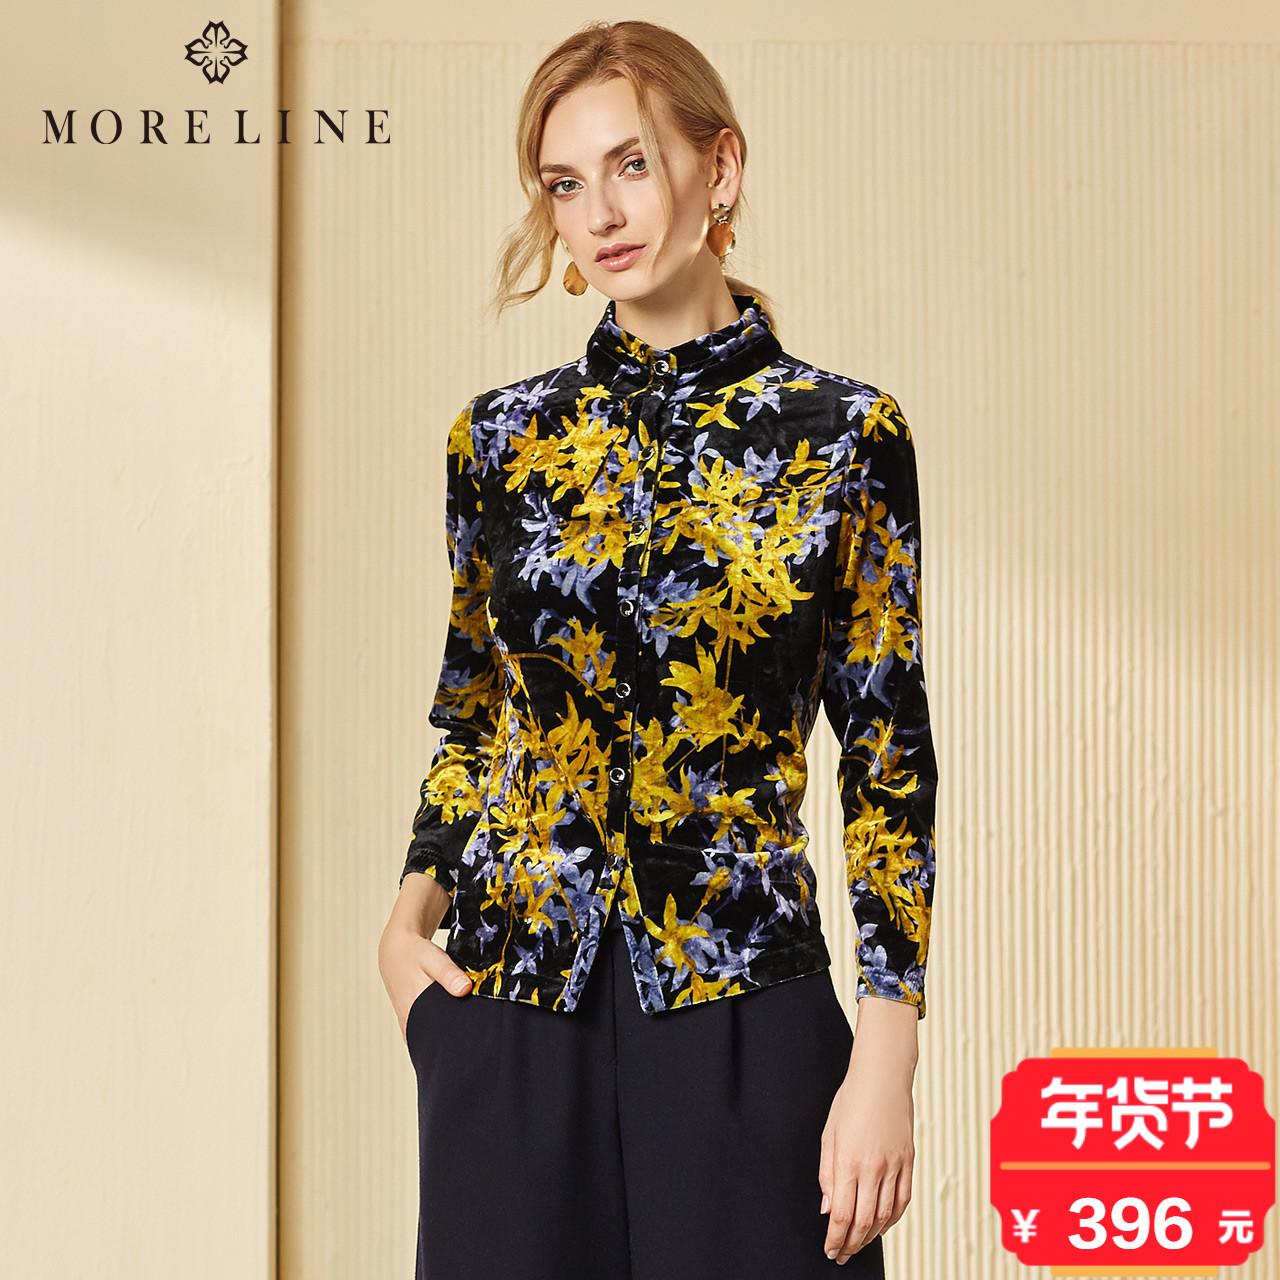 MORELINE沐兰秋冬新款丝绒外套气质优雅上衣1553801